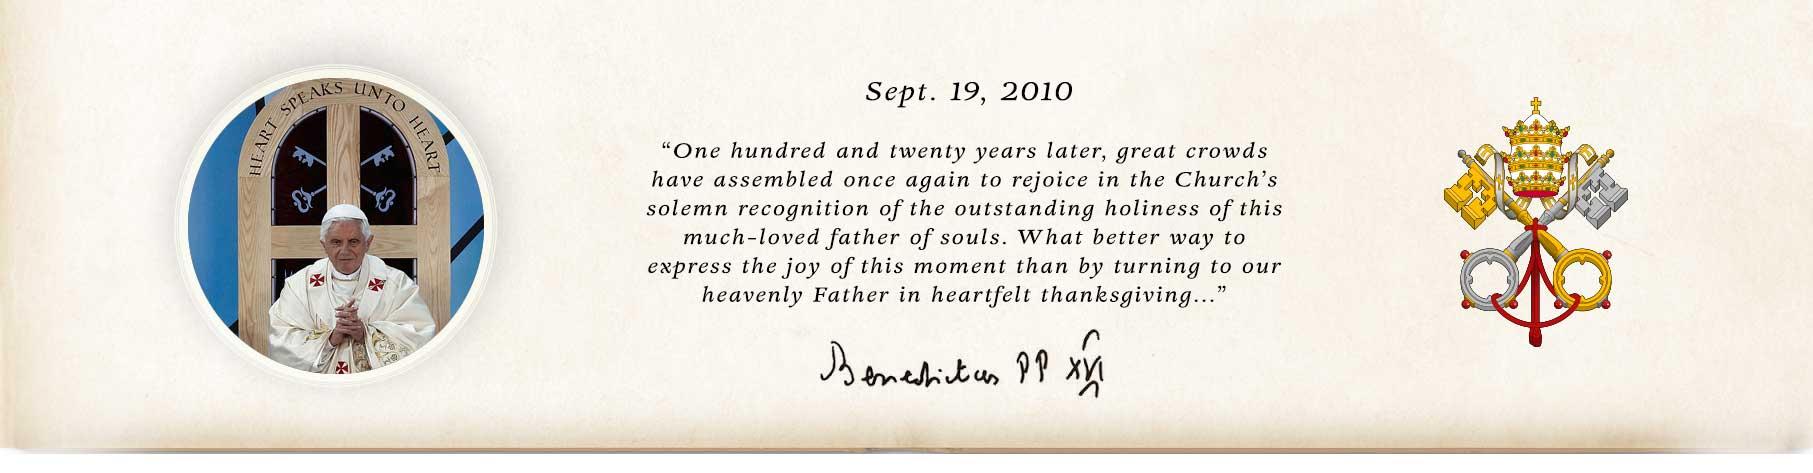 newman-prayer-for-canonization